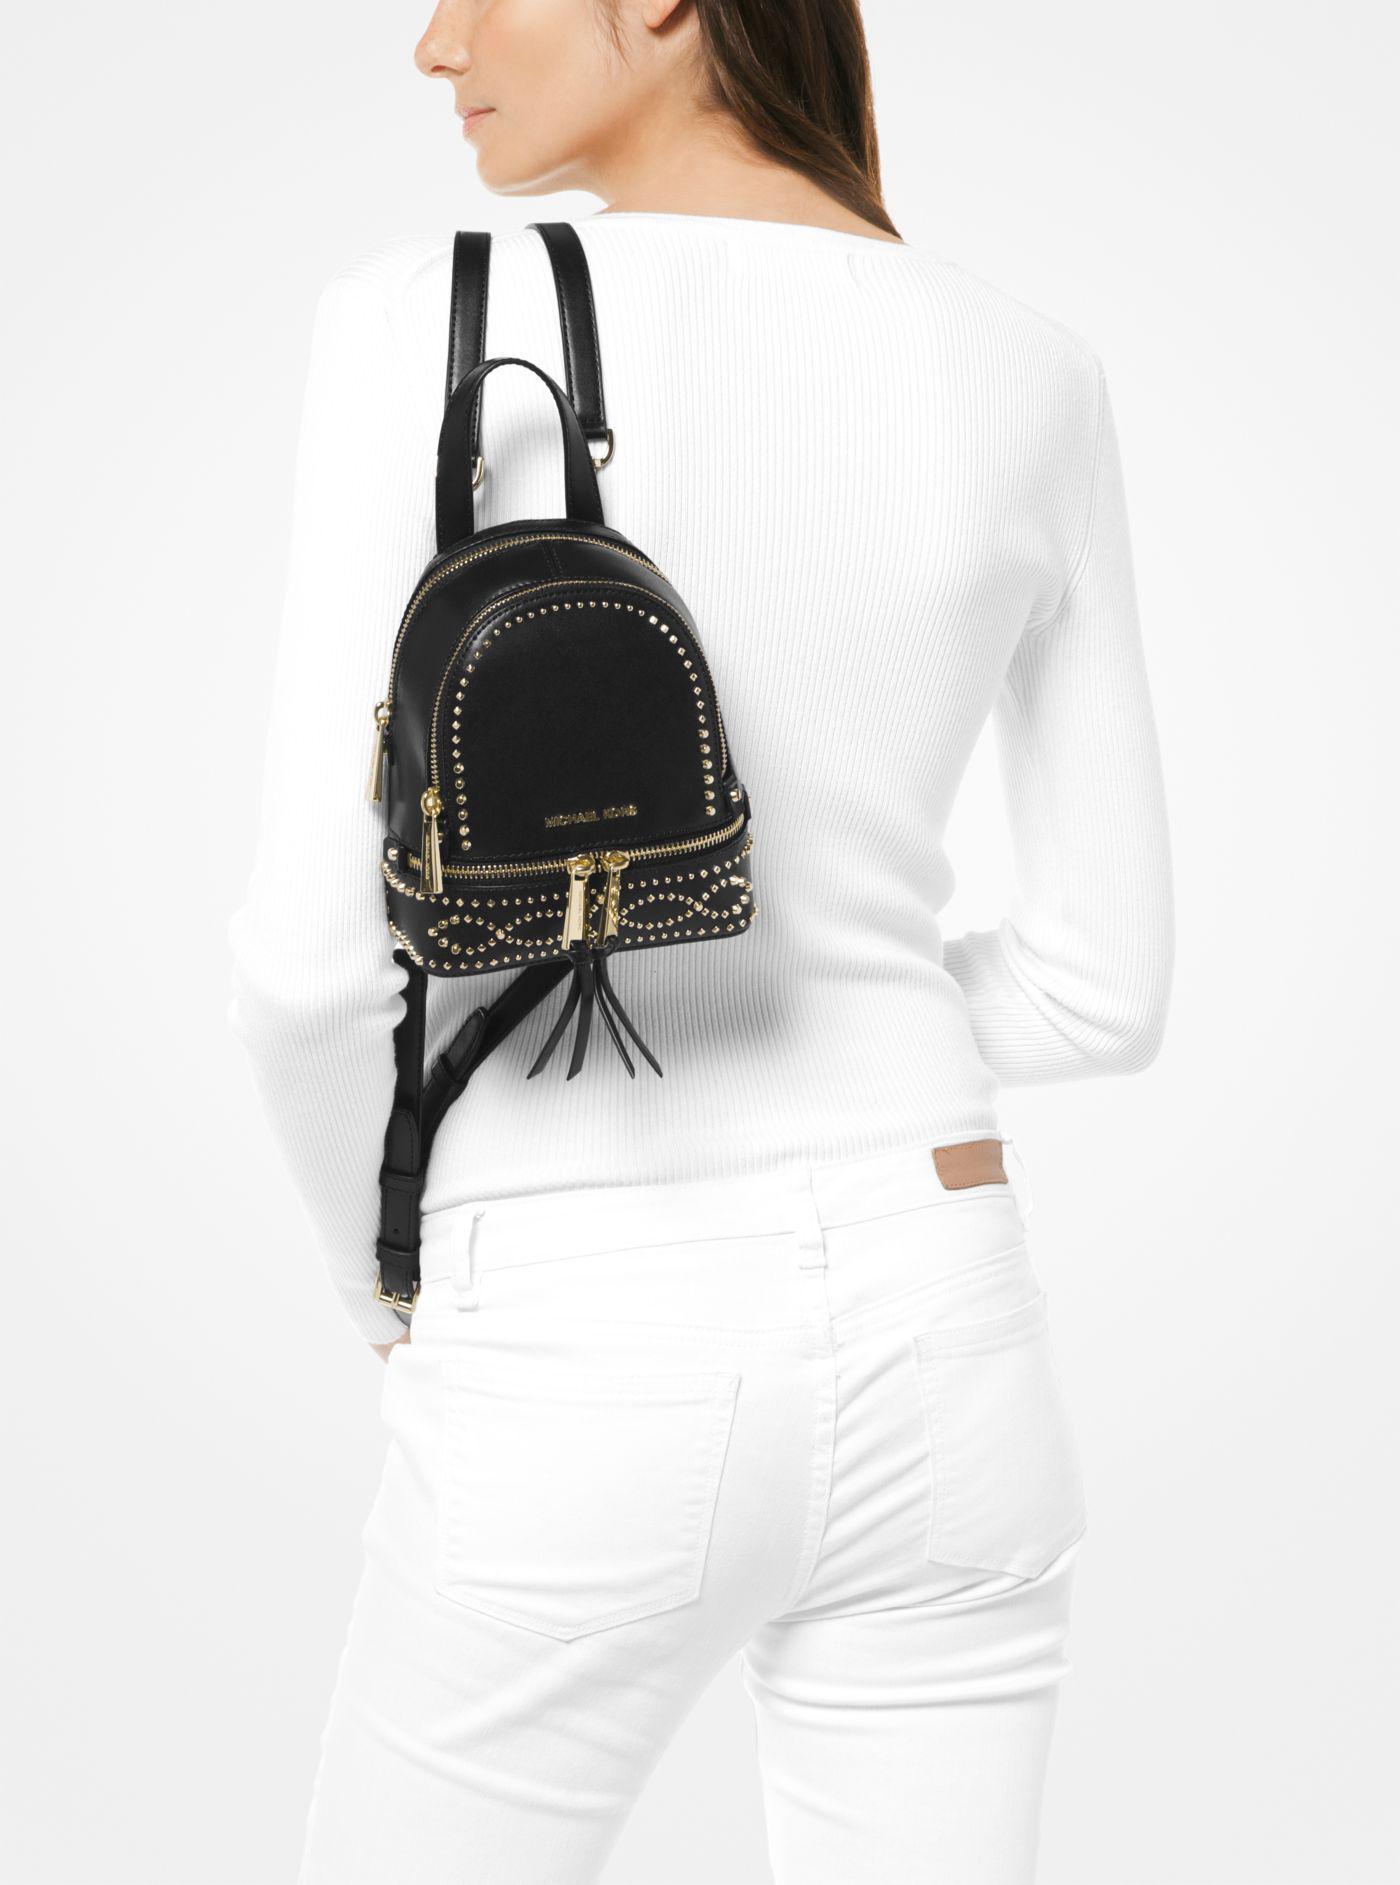 95478e8fb3ca Michael Kors Rhea Mini Studded Leather Backpack in Black - Lyst